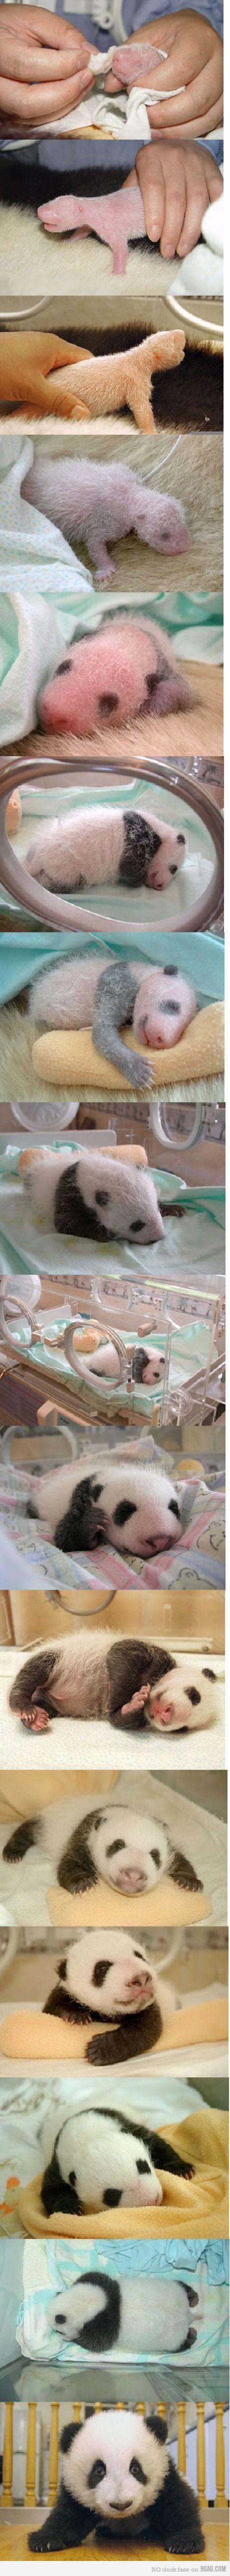 A brief panda childhood.